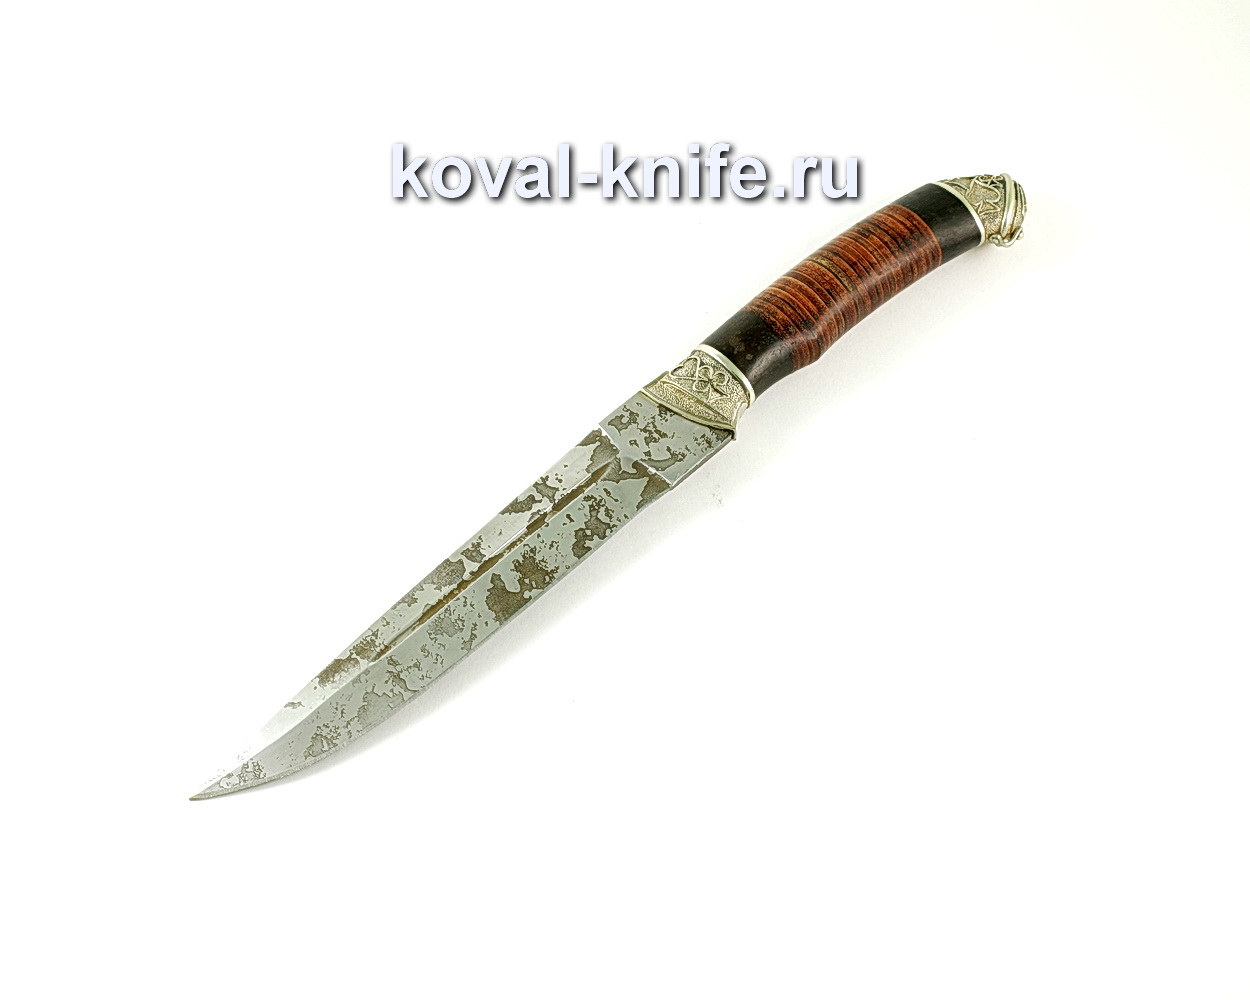 Нож Пластун (сталь 95х18), рукоять граб, кожа, литье A243